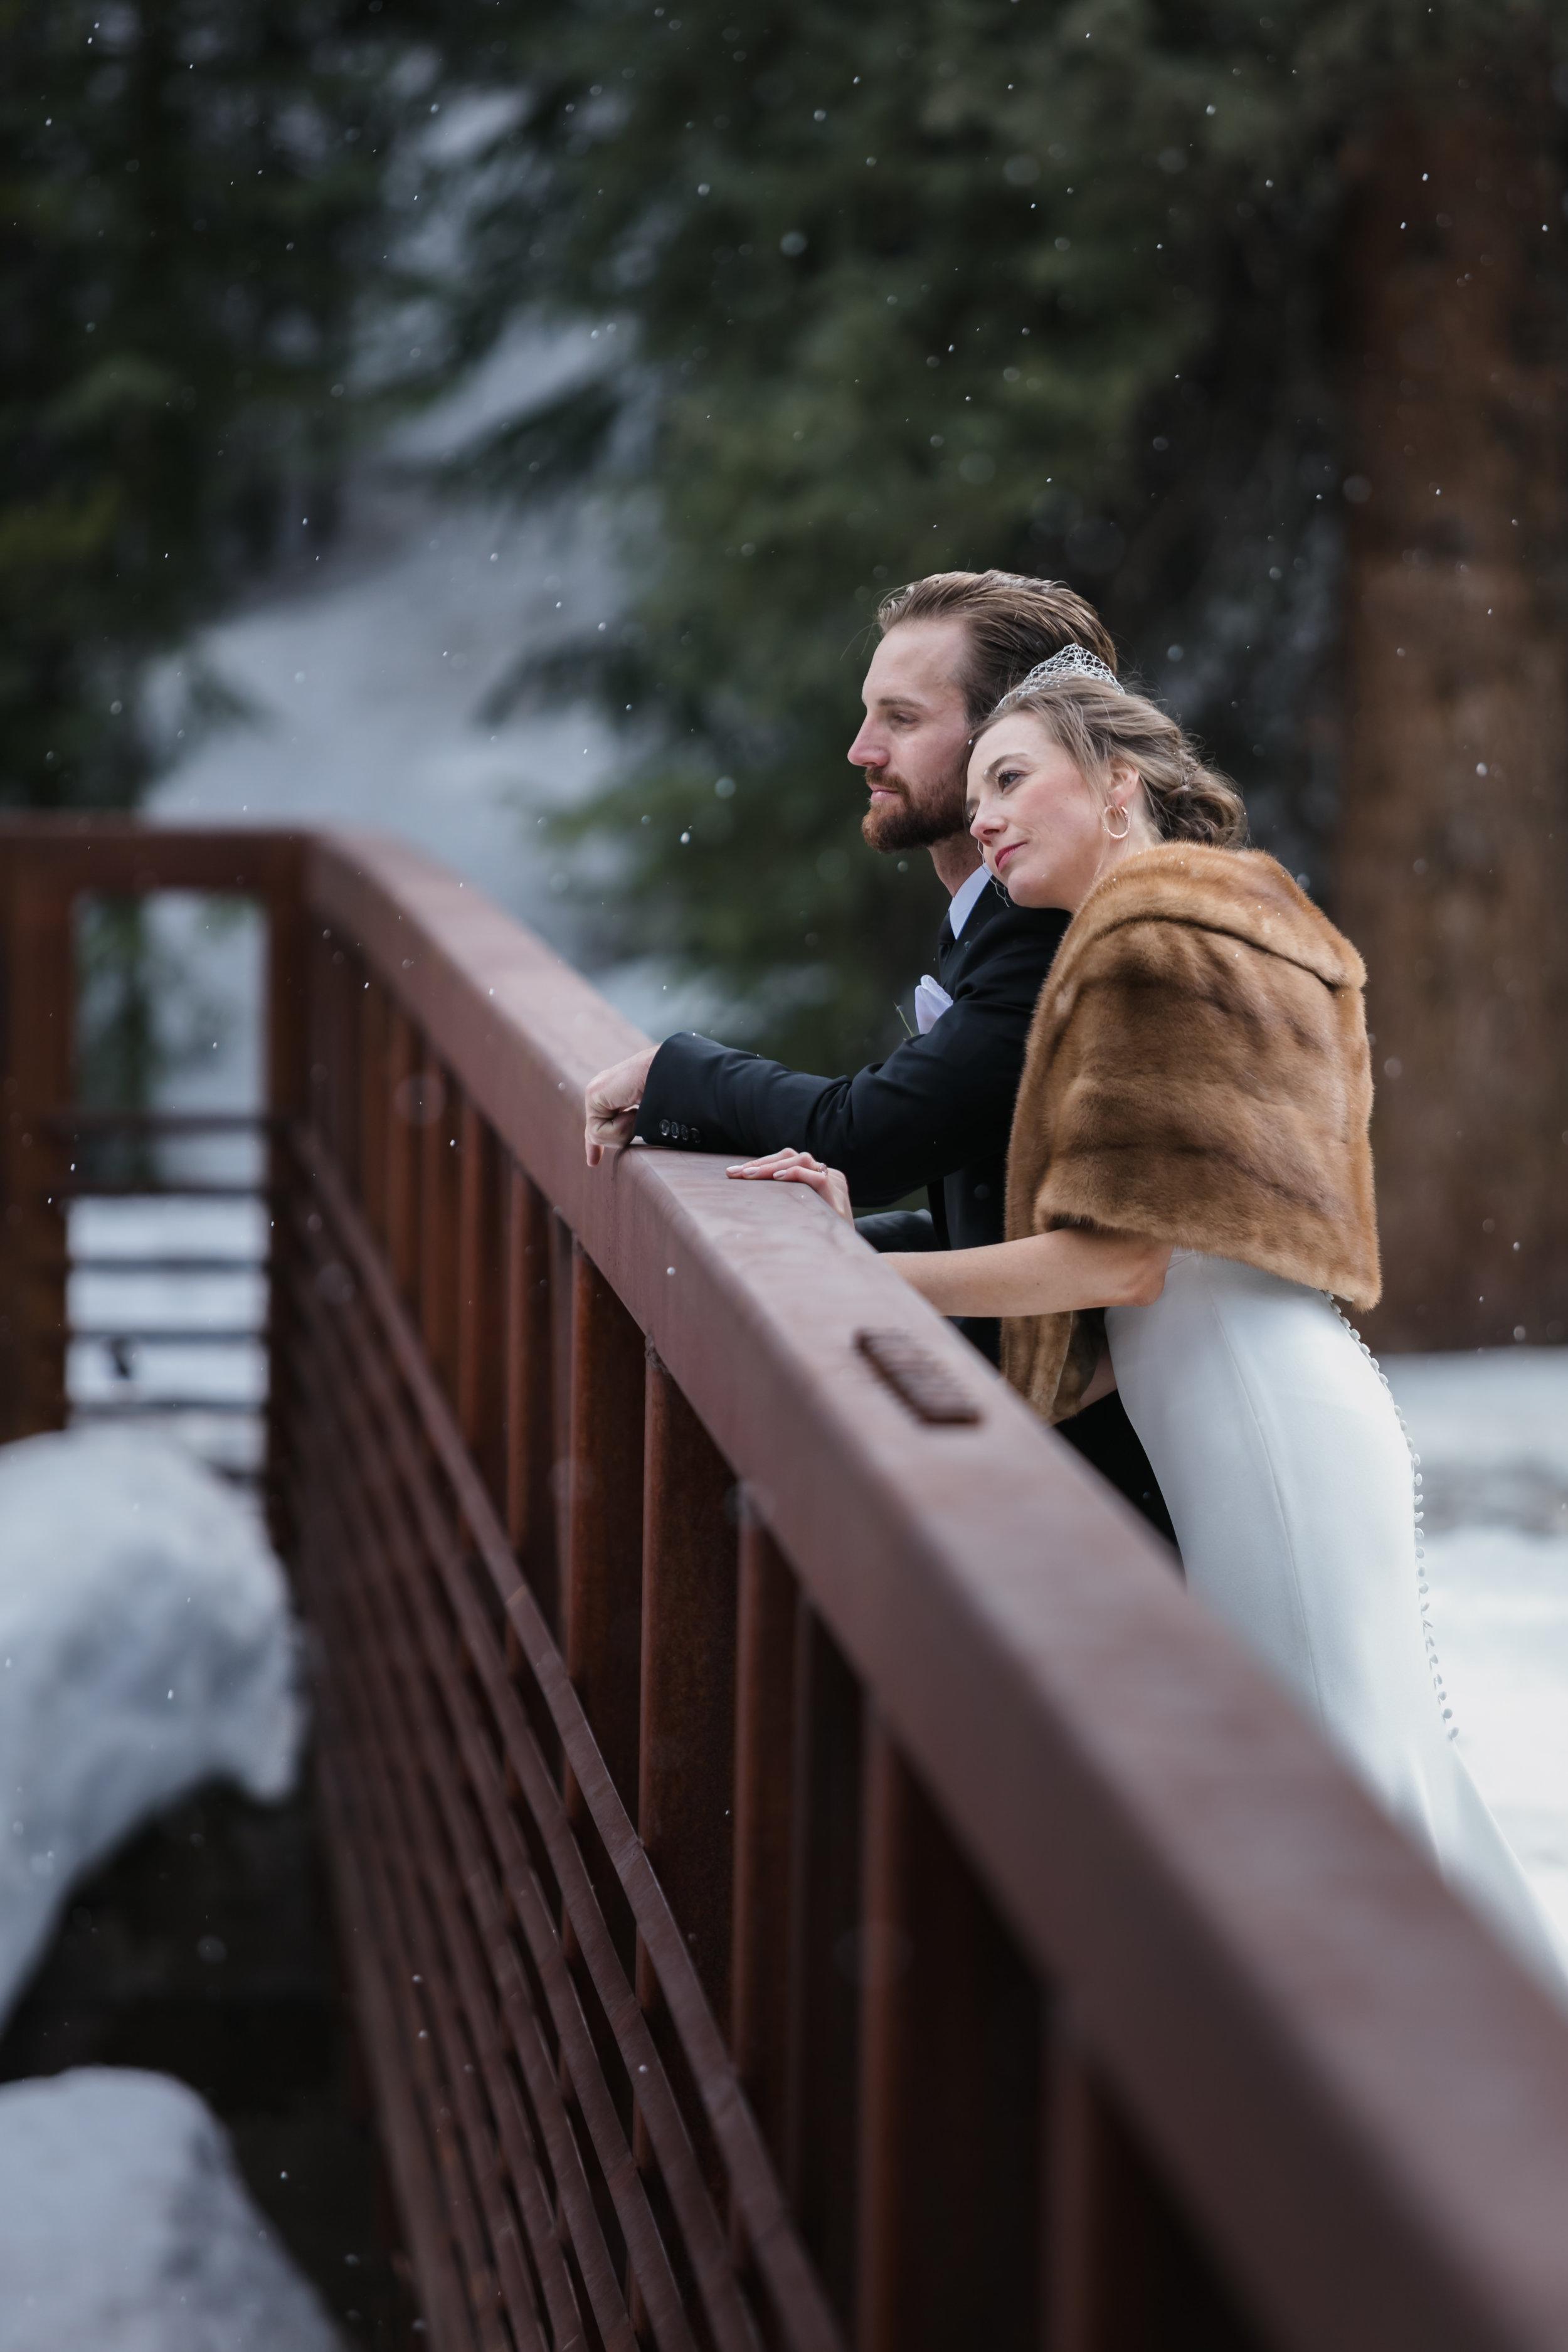 vild-photography-photographer-colorado-intimate-wedding-adventure-Stephanie- Adam-466.jpg